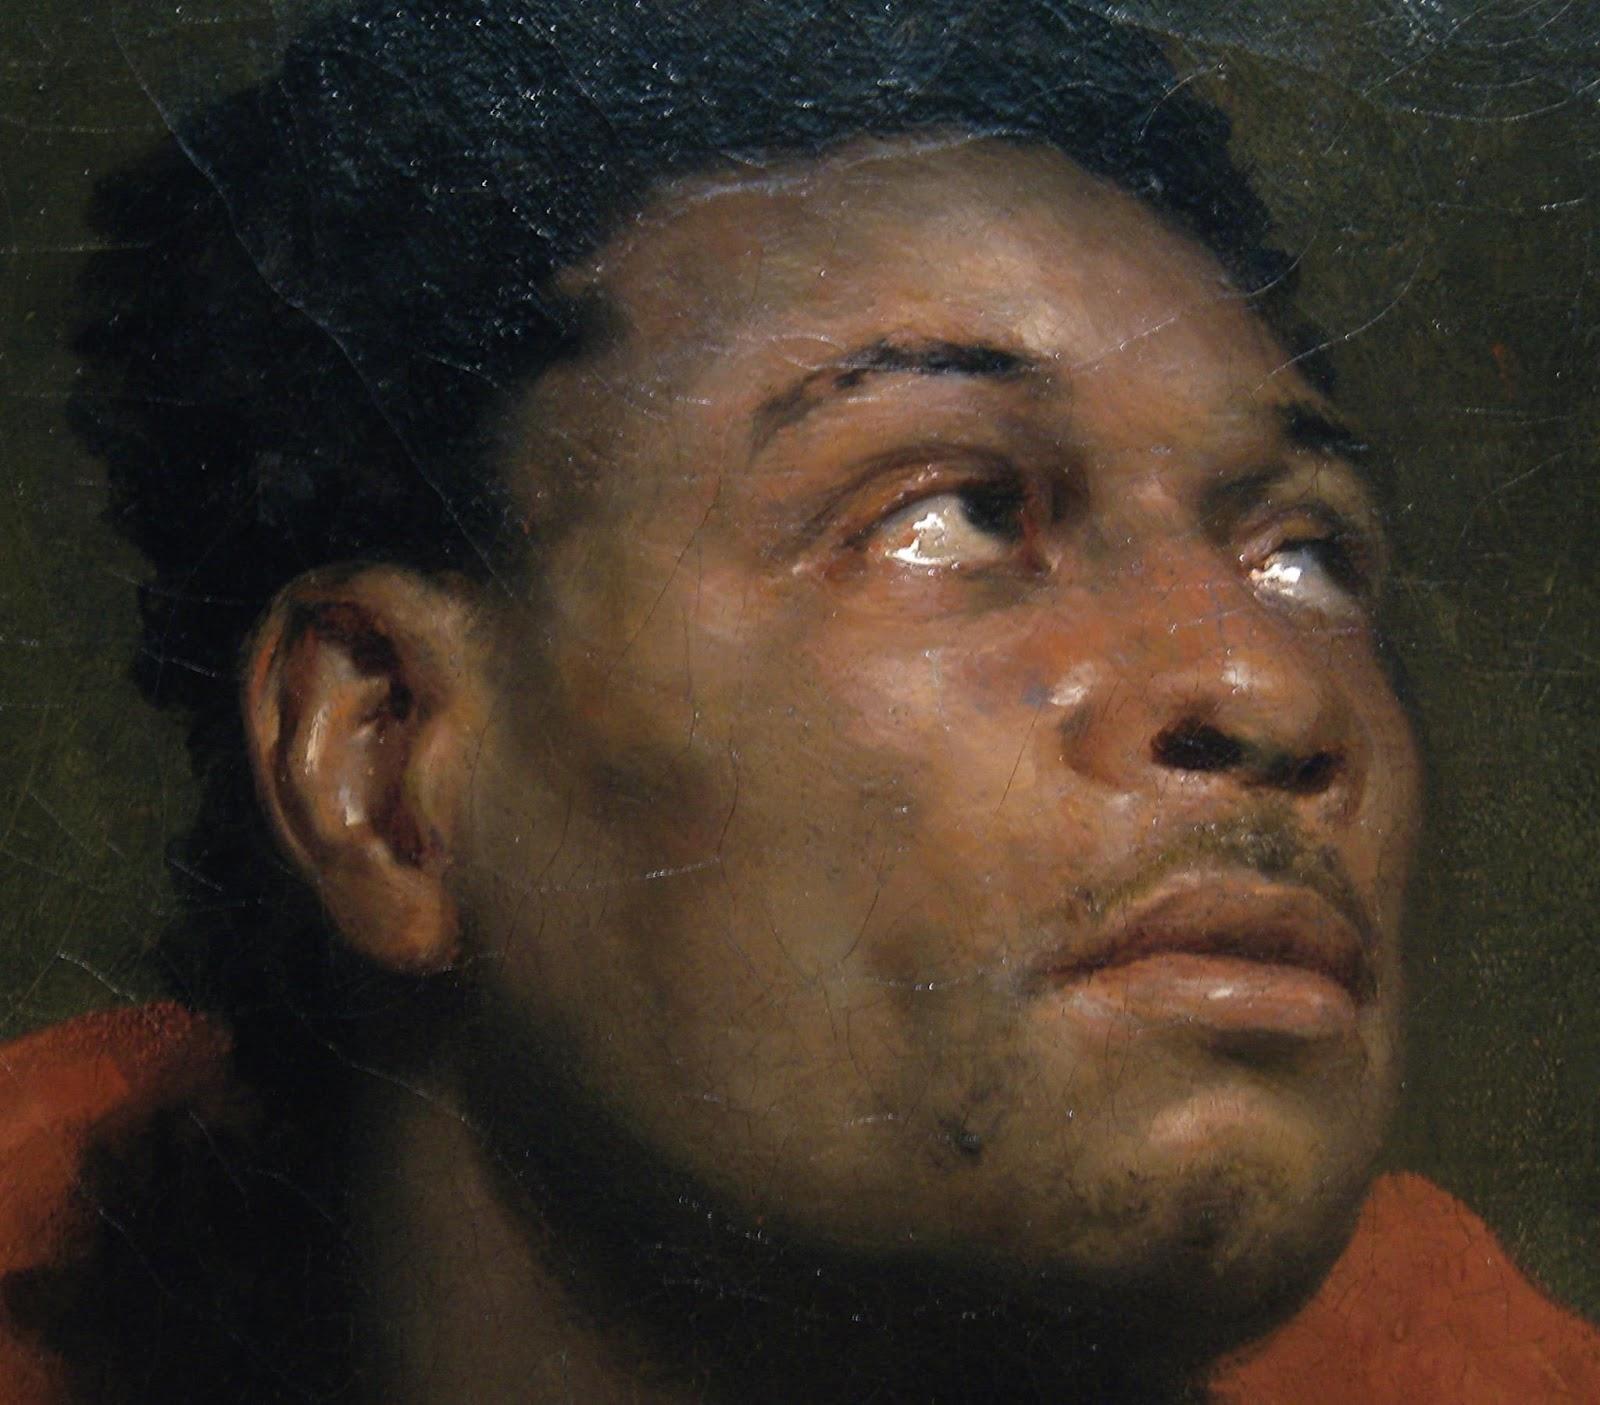 Detail of   The Captive Slave     image courtesy of Juan J. Ramirez